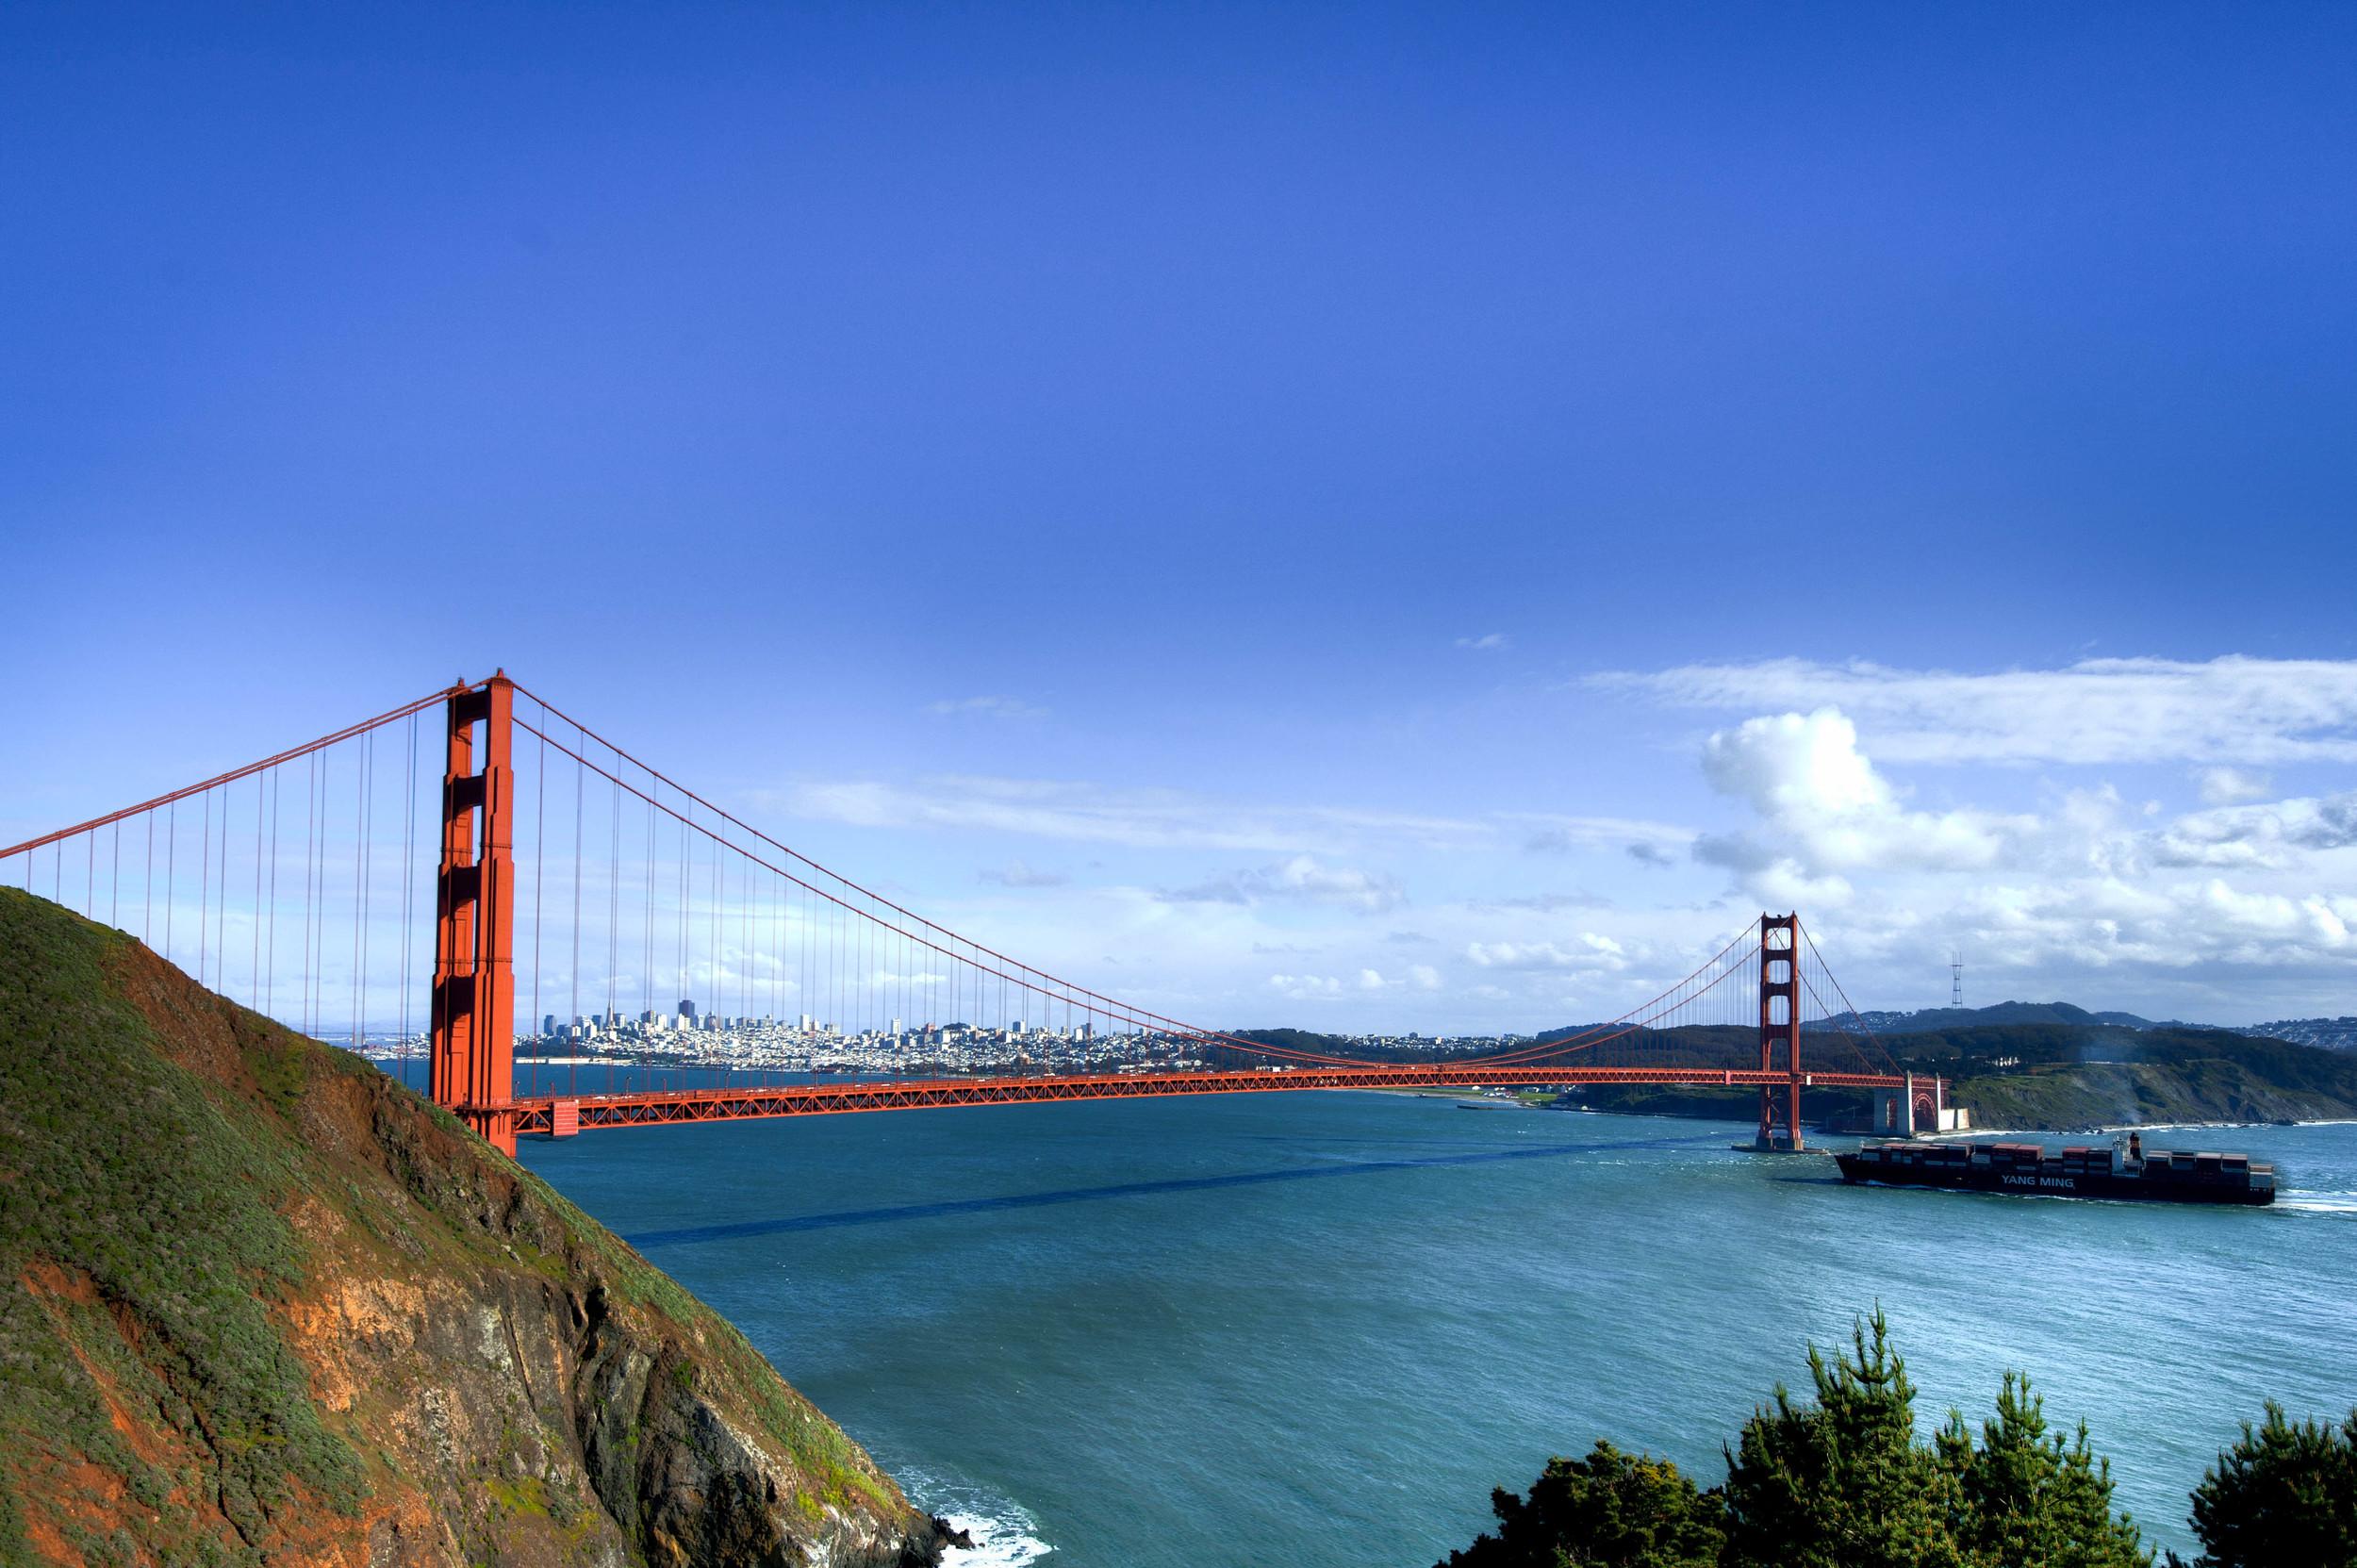 Golden_Gate_Bridge_and_ship.jpg